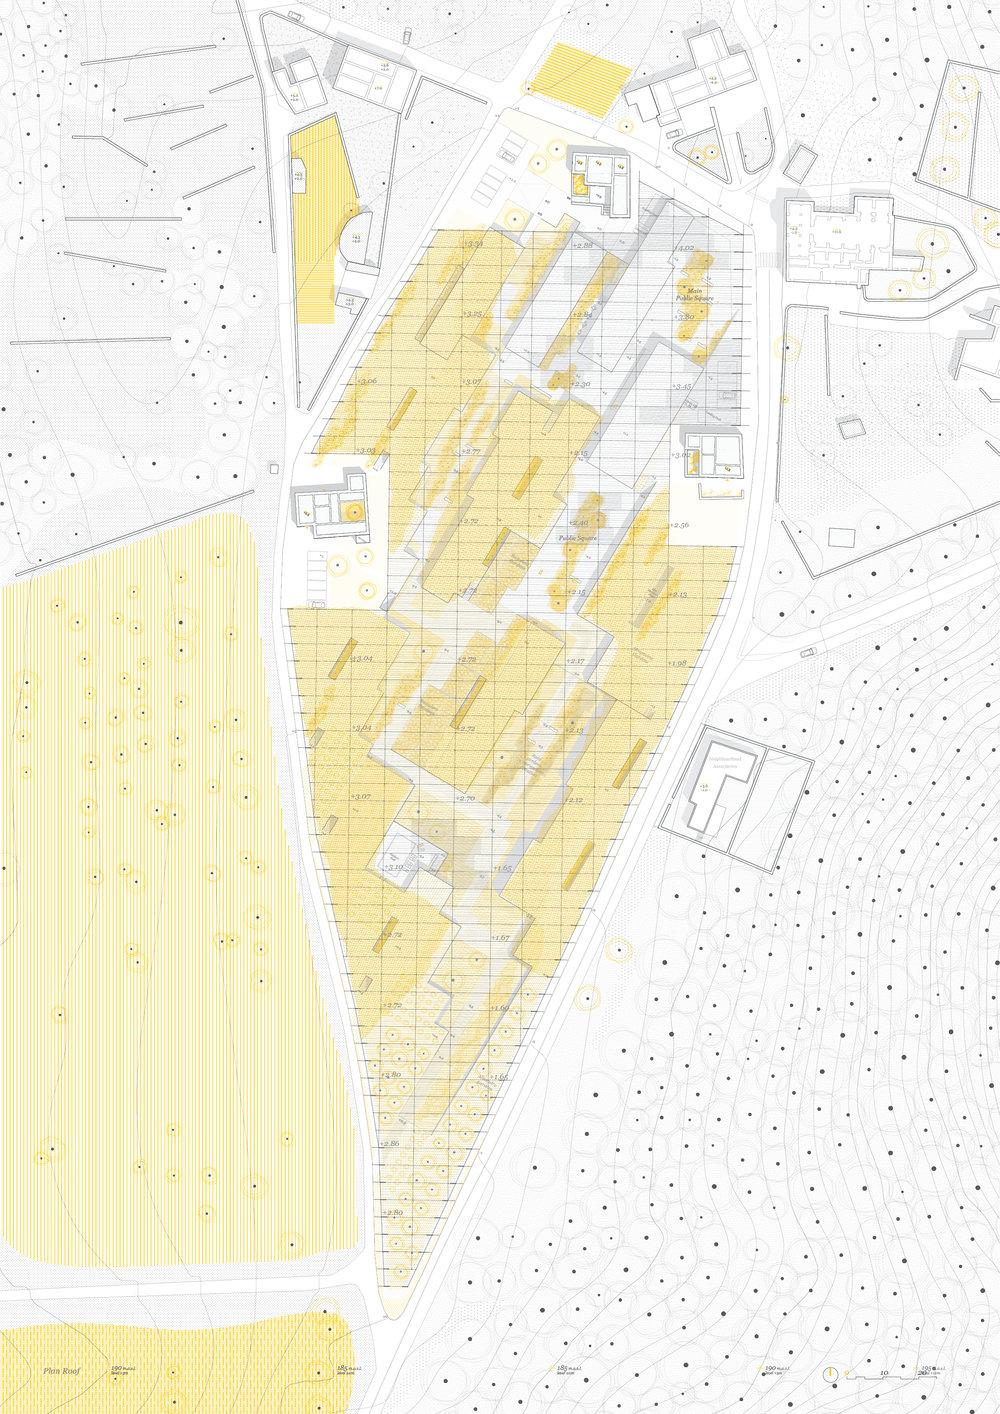 03_LL_Roof+CanopyPlan.jpg